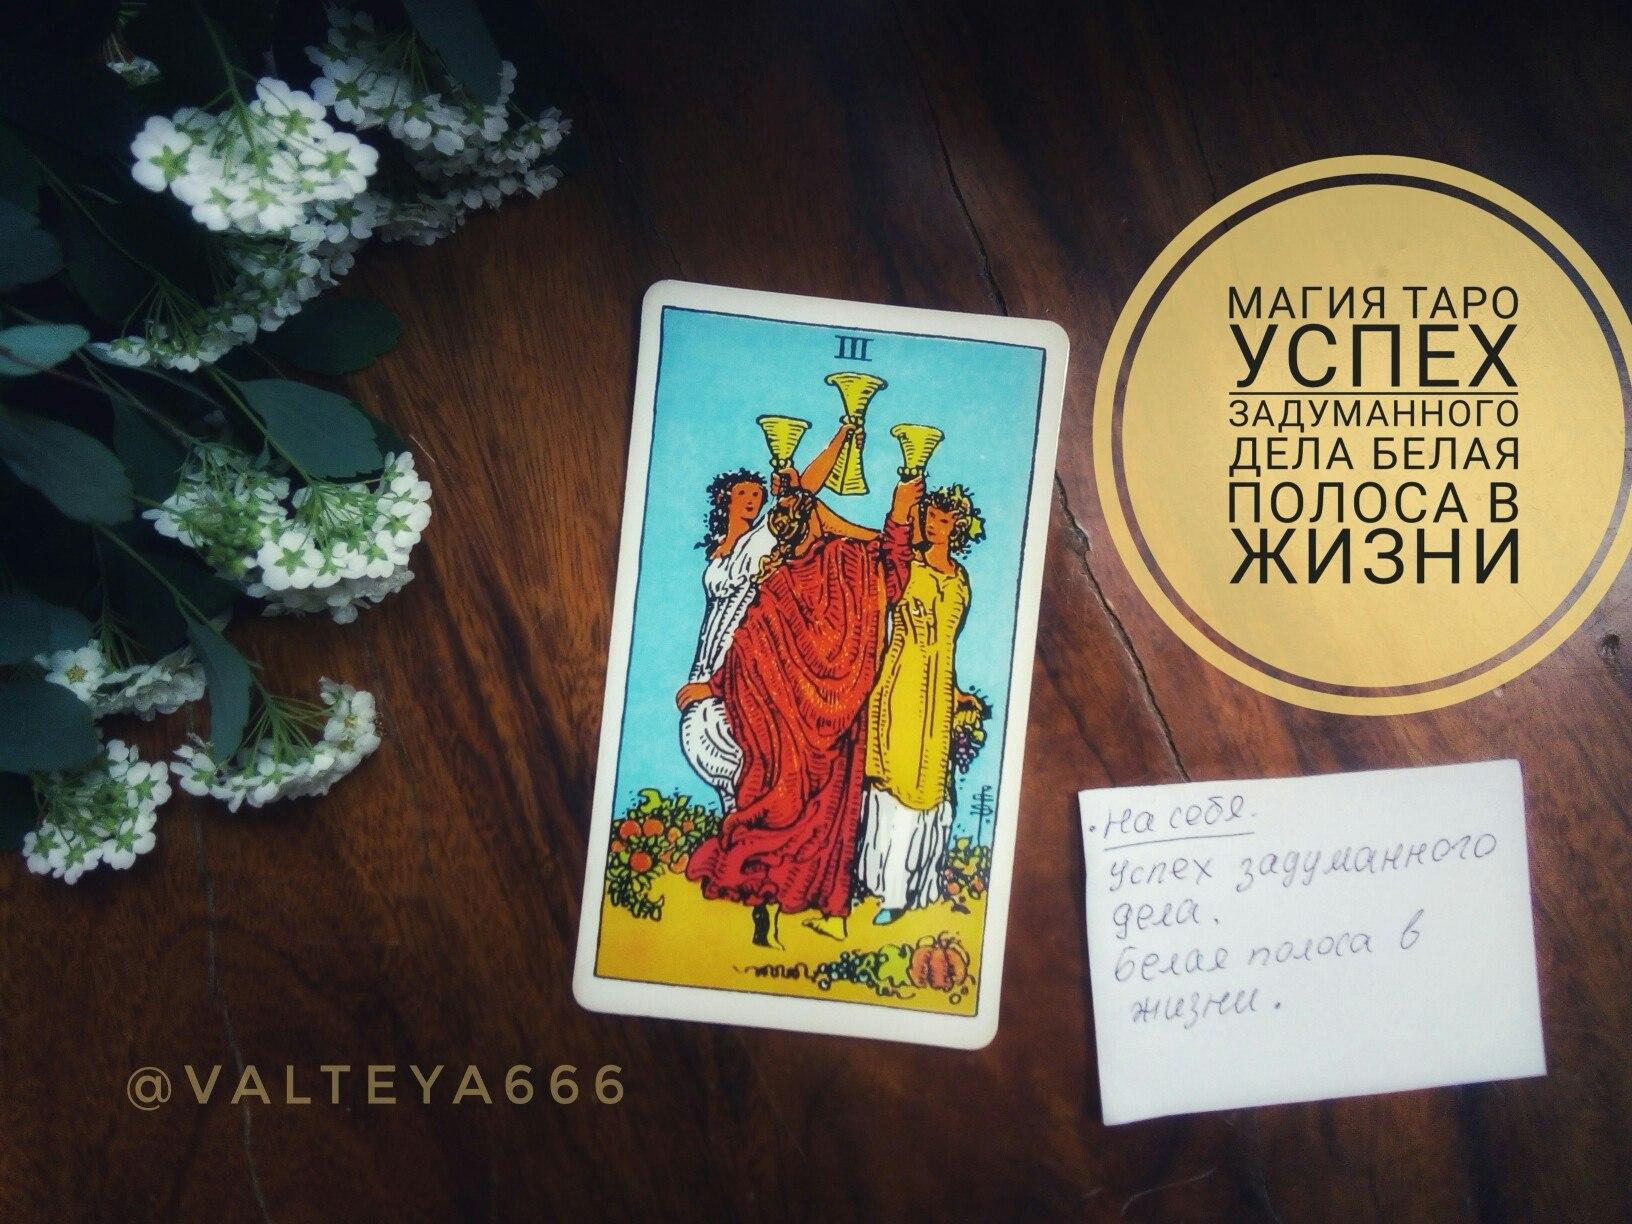 Хештег таро на   Салон Магии и мистики Елены Руденко ( Валтеи ). Киев ,тел: 0506251562  T1zYmI_9fks